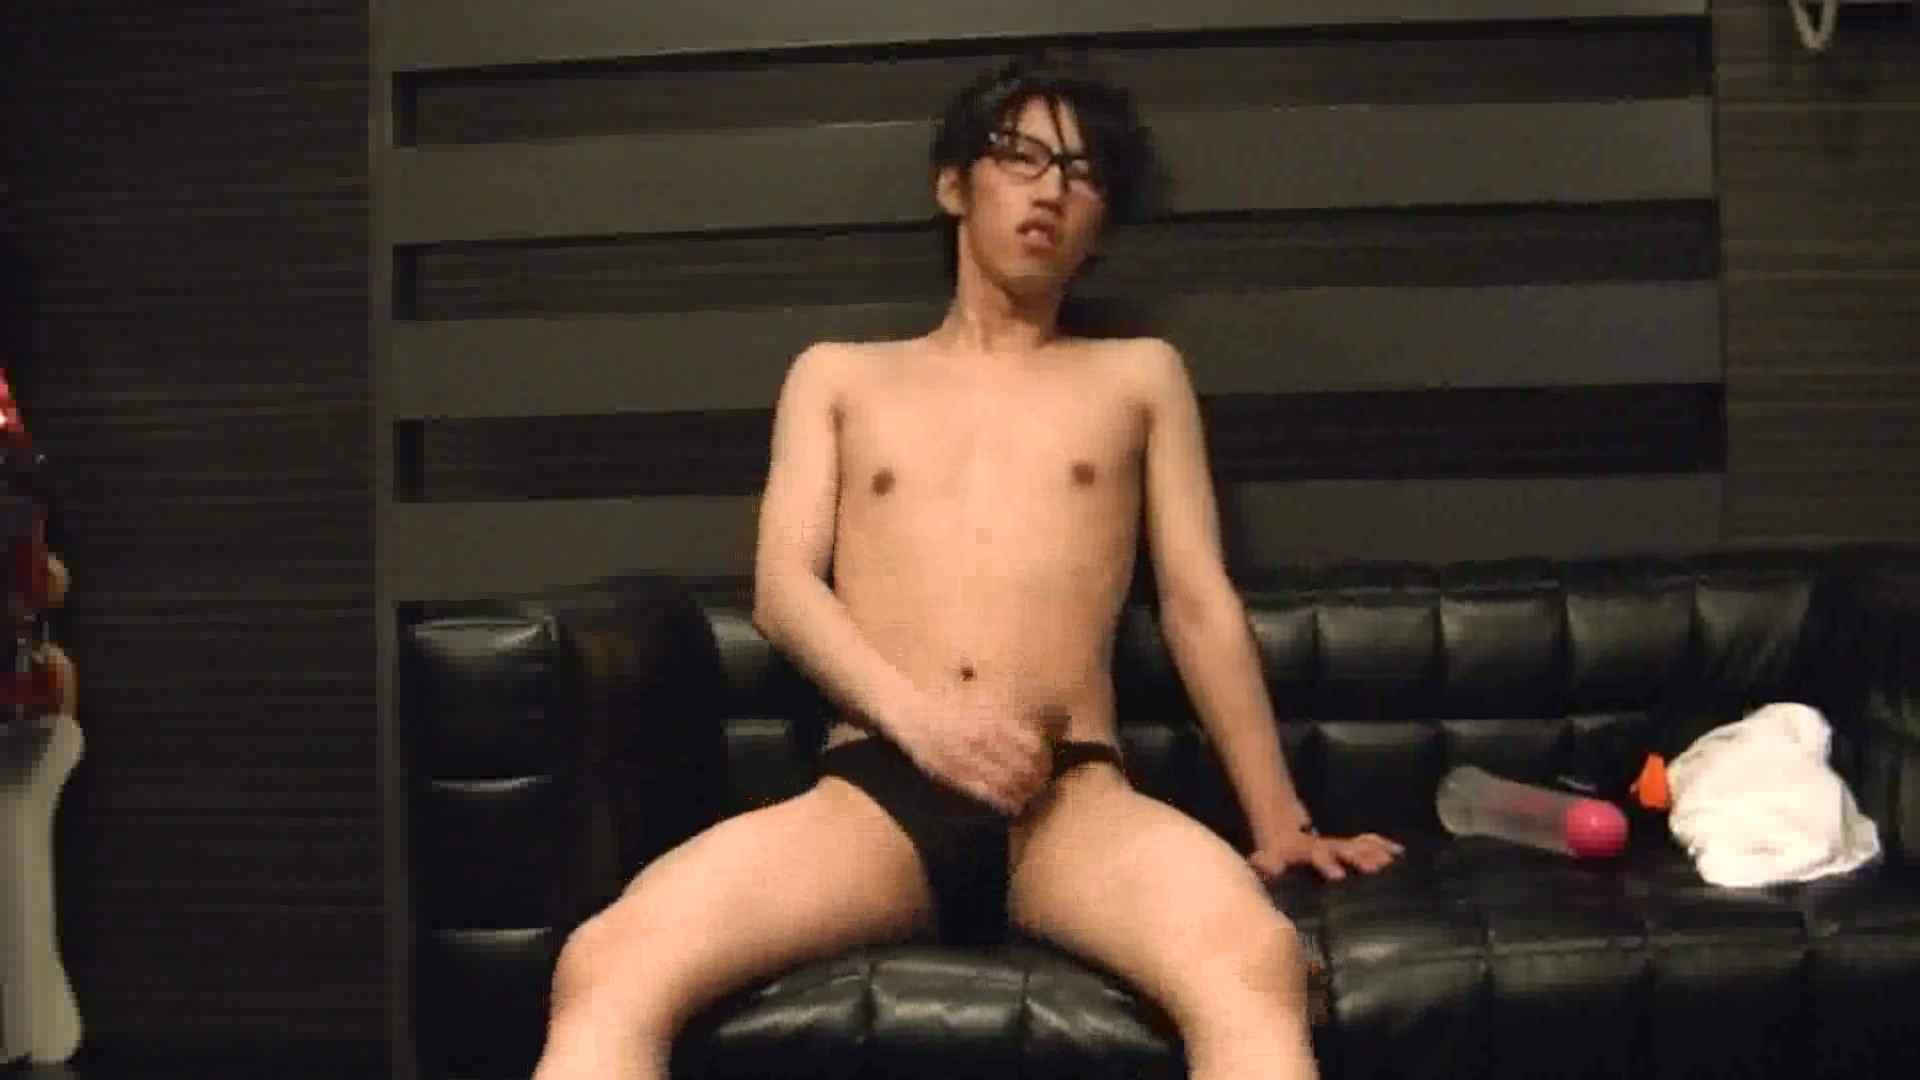 ONA見せカーニバル!! Vol3 男  93pic 46